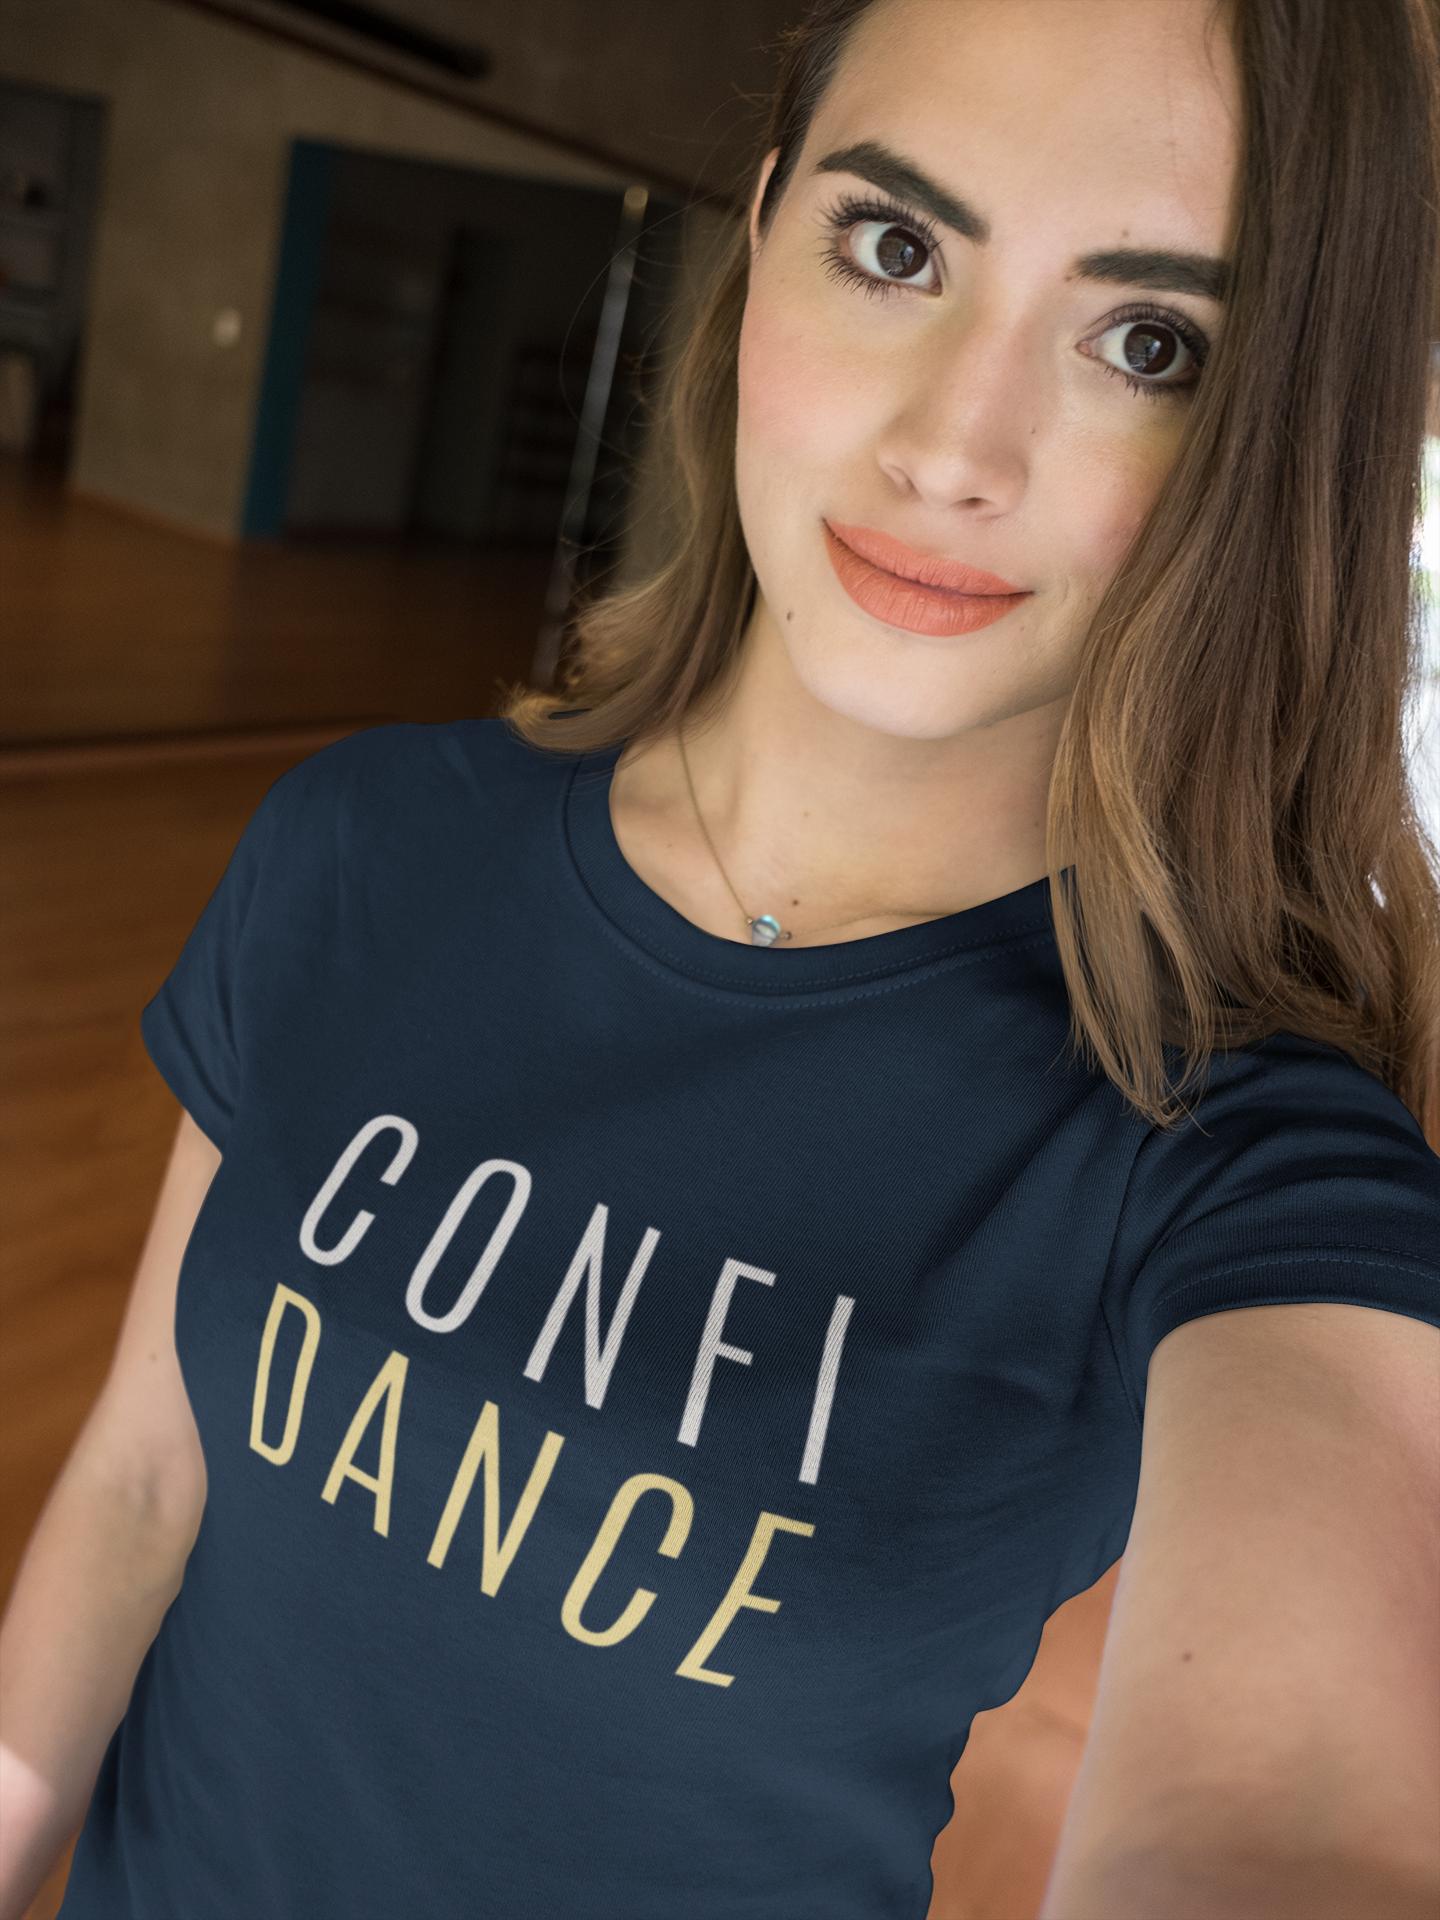 Cara_Selfie_Confidance